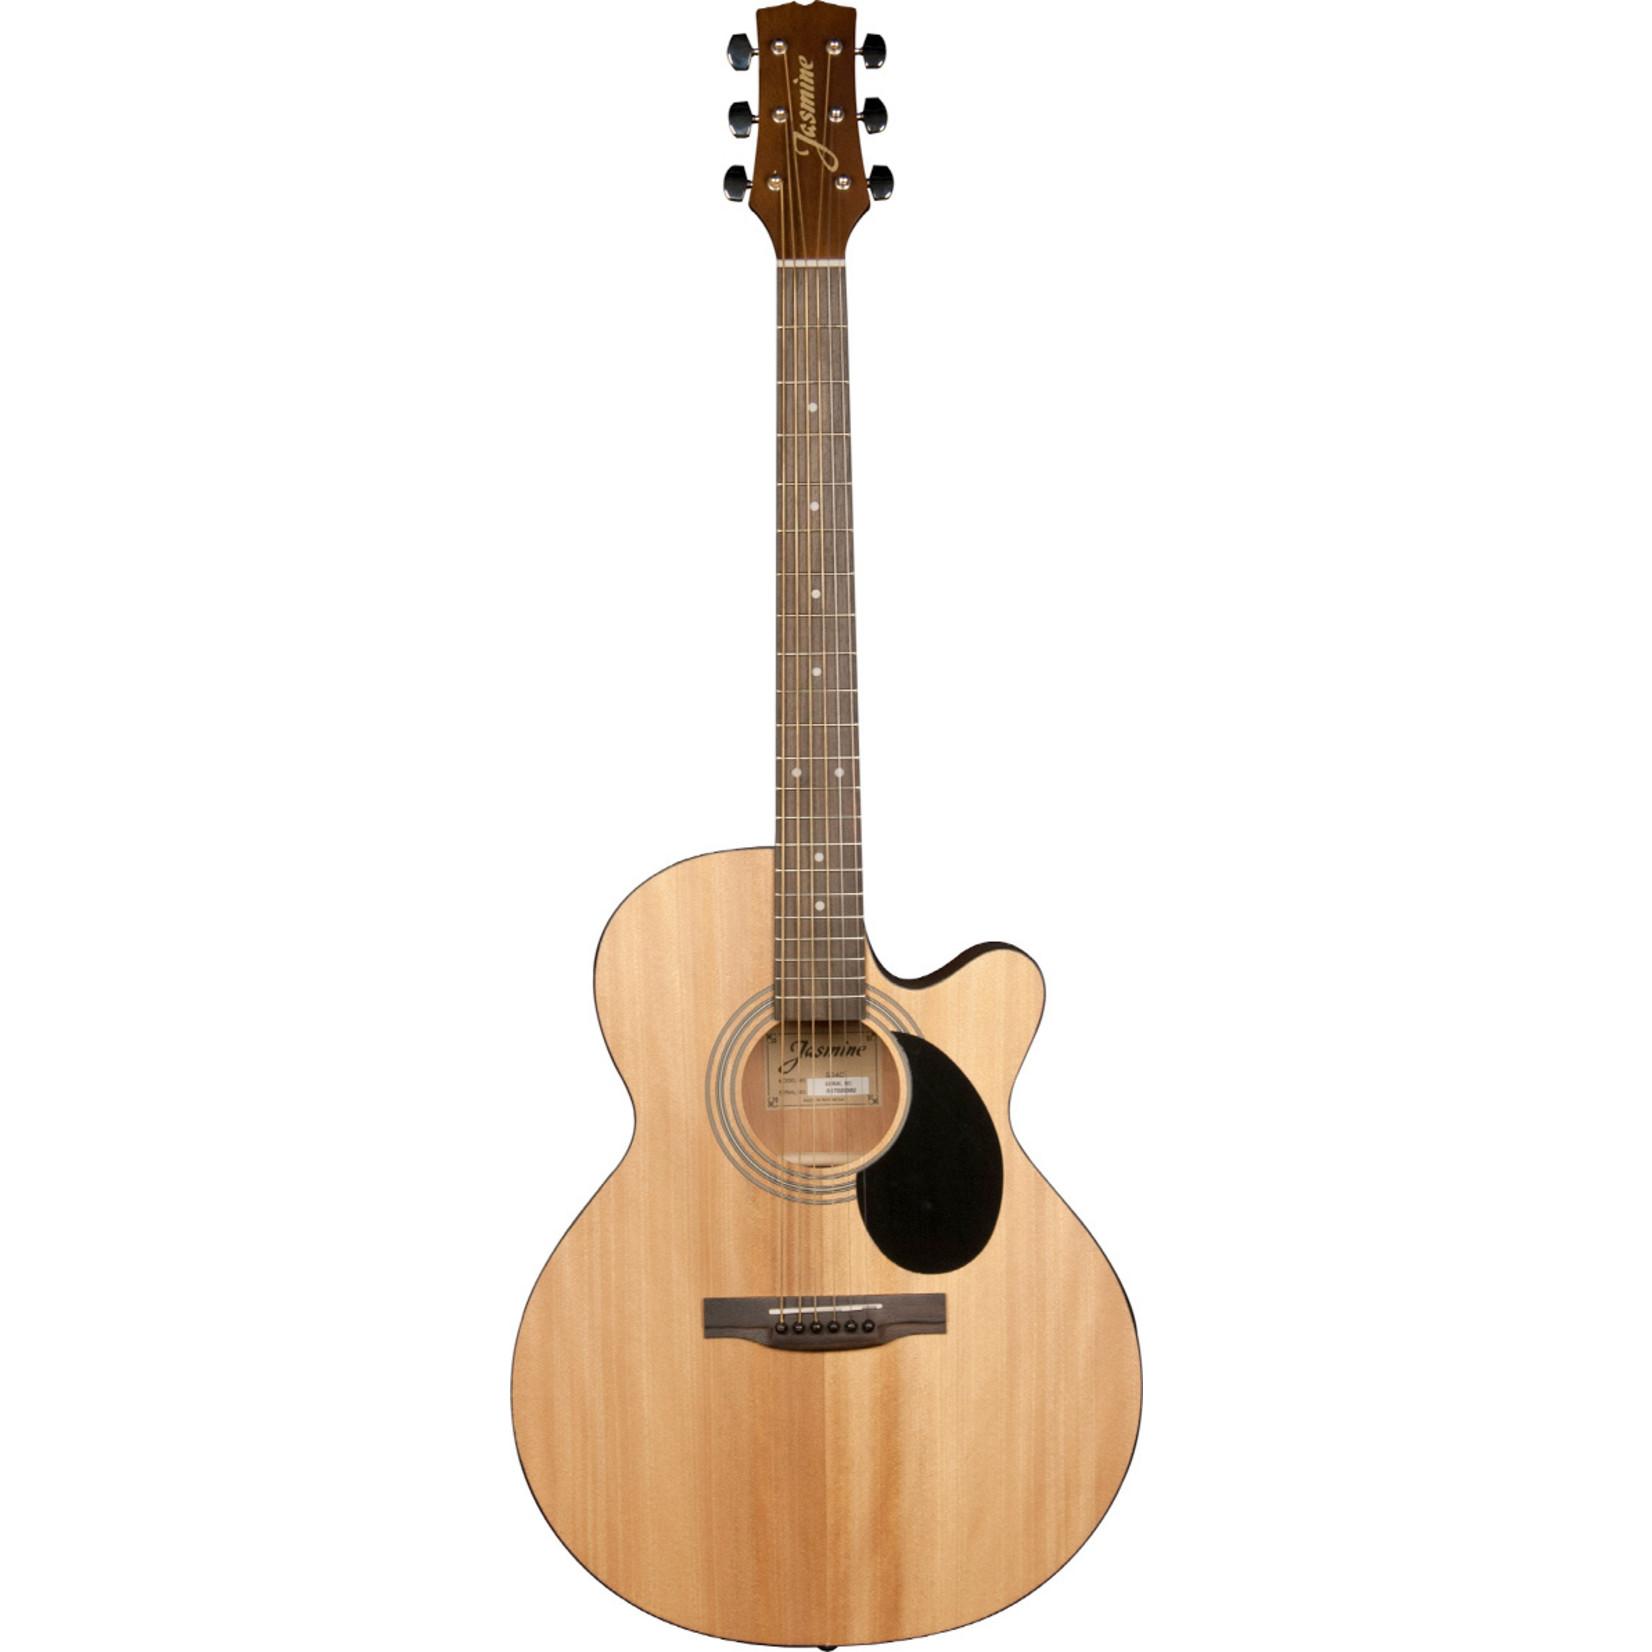 Jasmine Jasmine S34C Acoustic Guitar